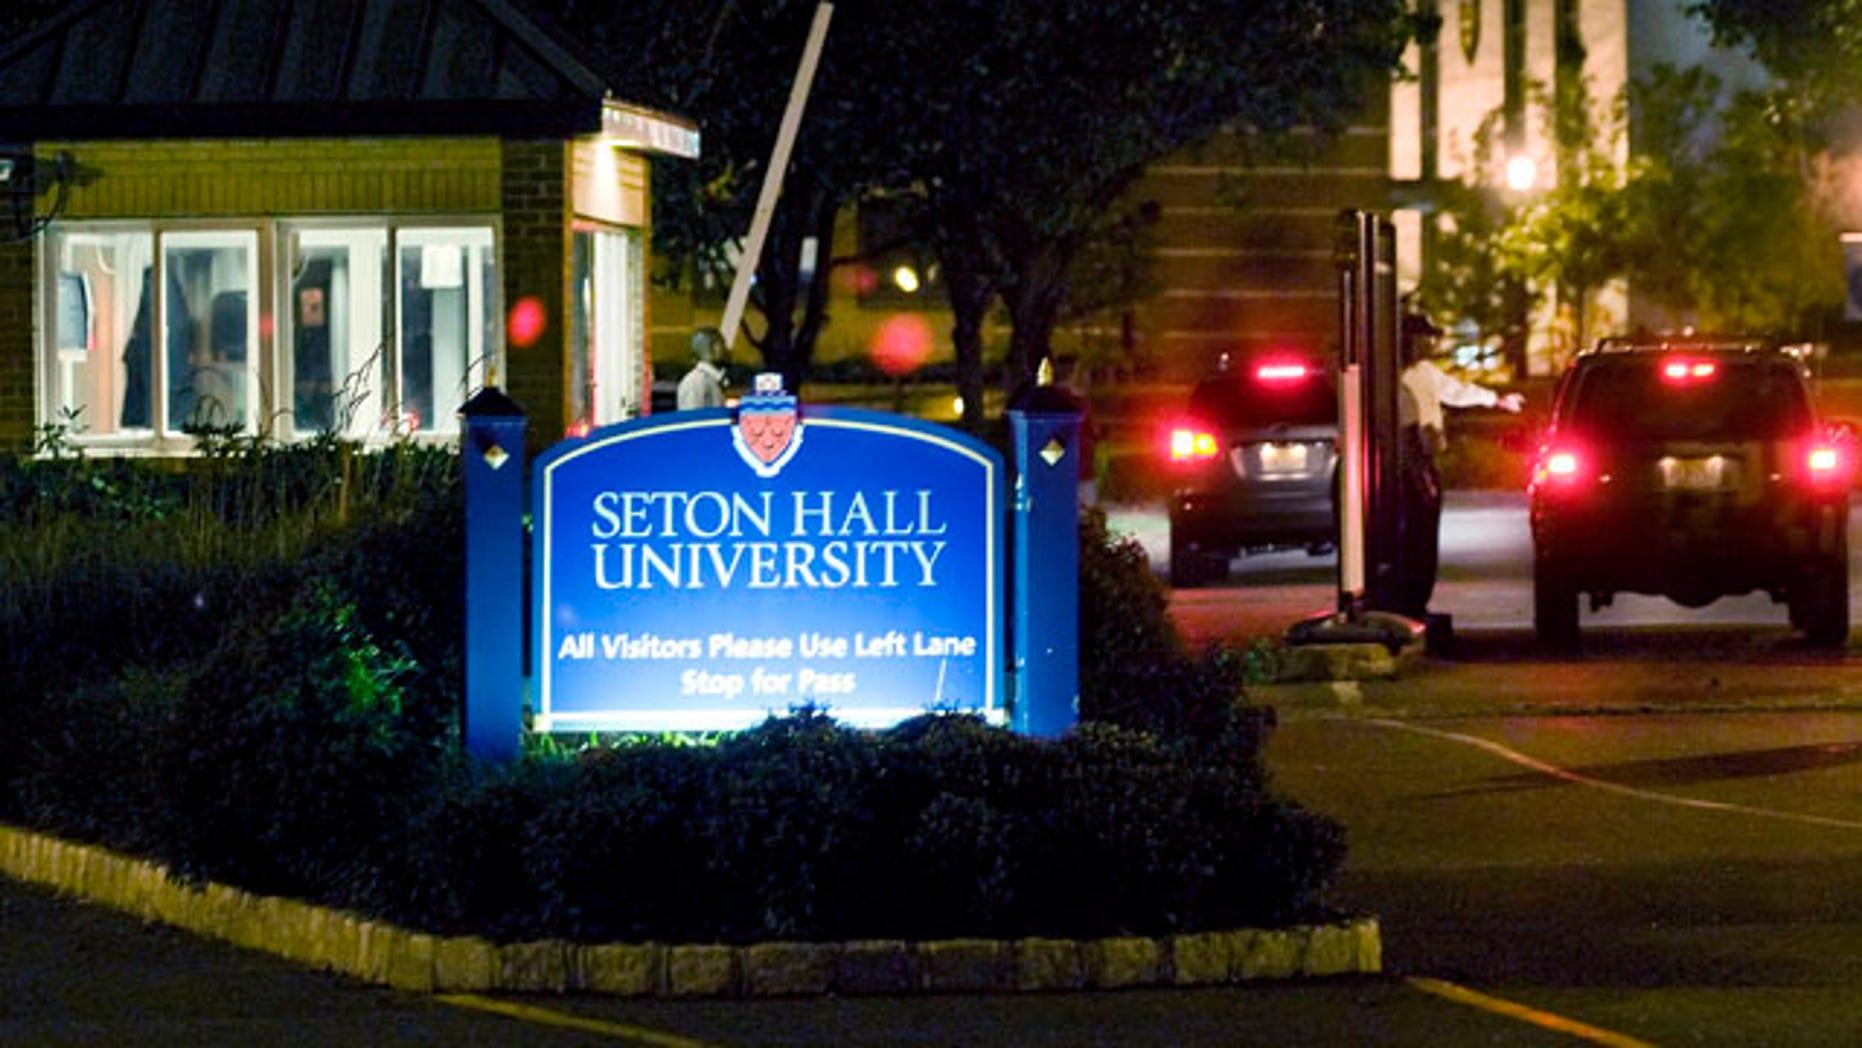 The Seton Hall University campus in East Orange, N.J.